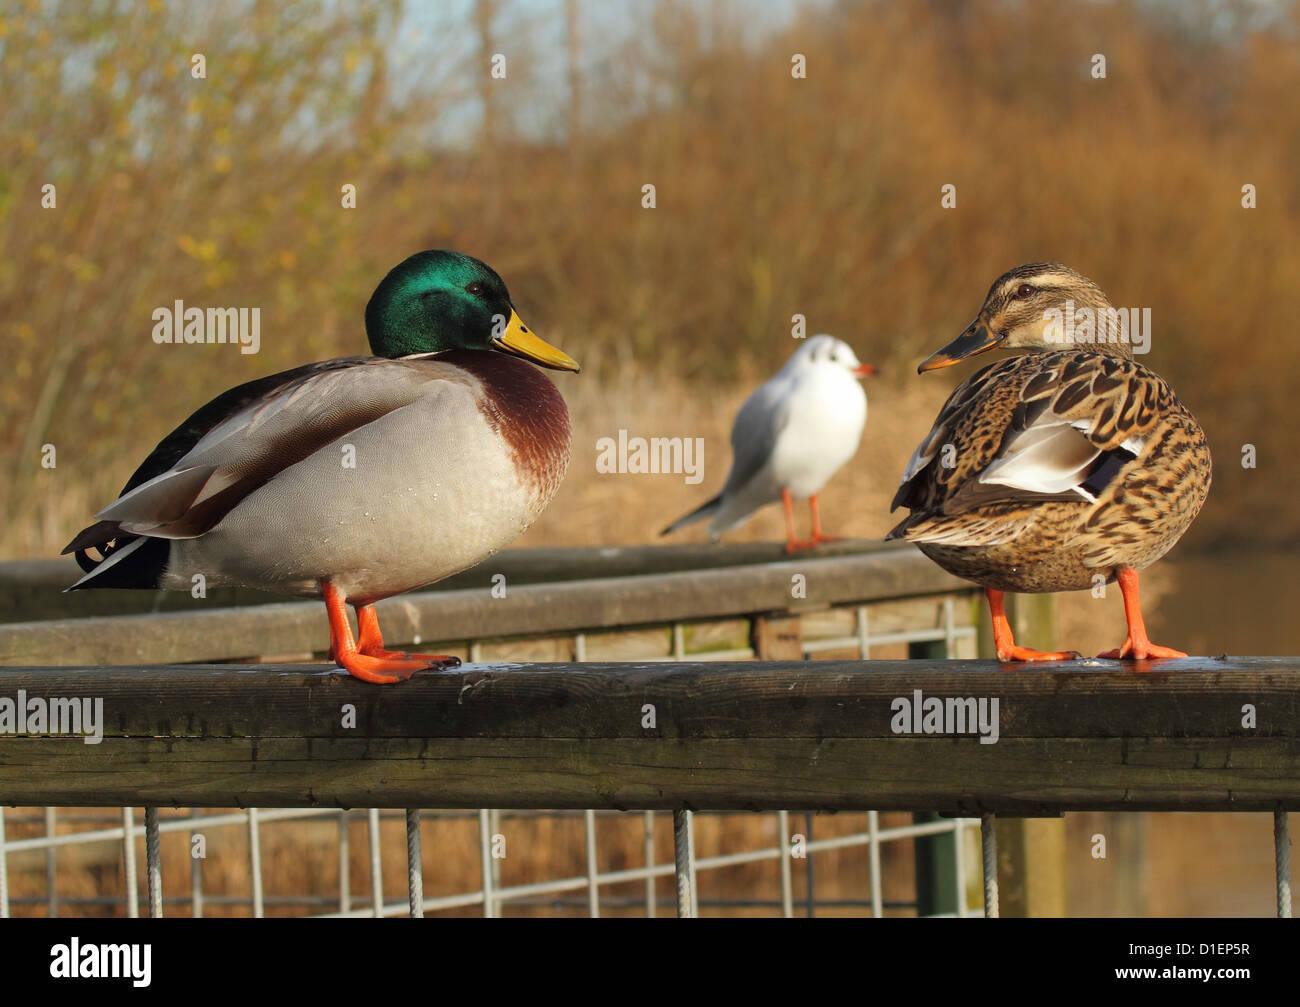 mallard ducks perched on fence - Stock Image